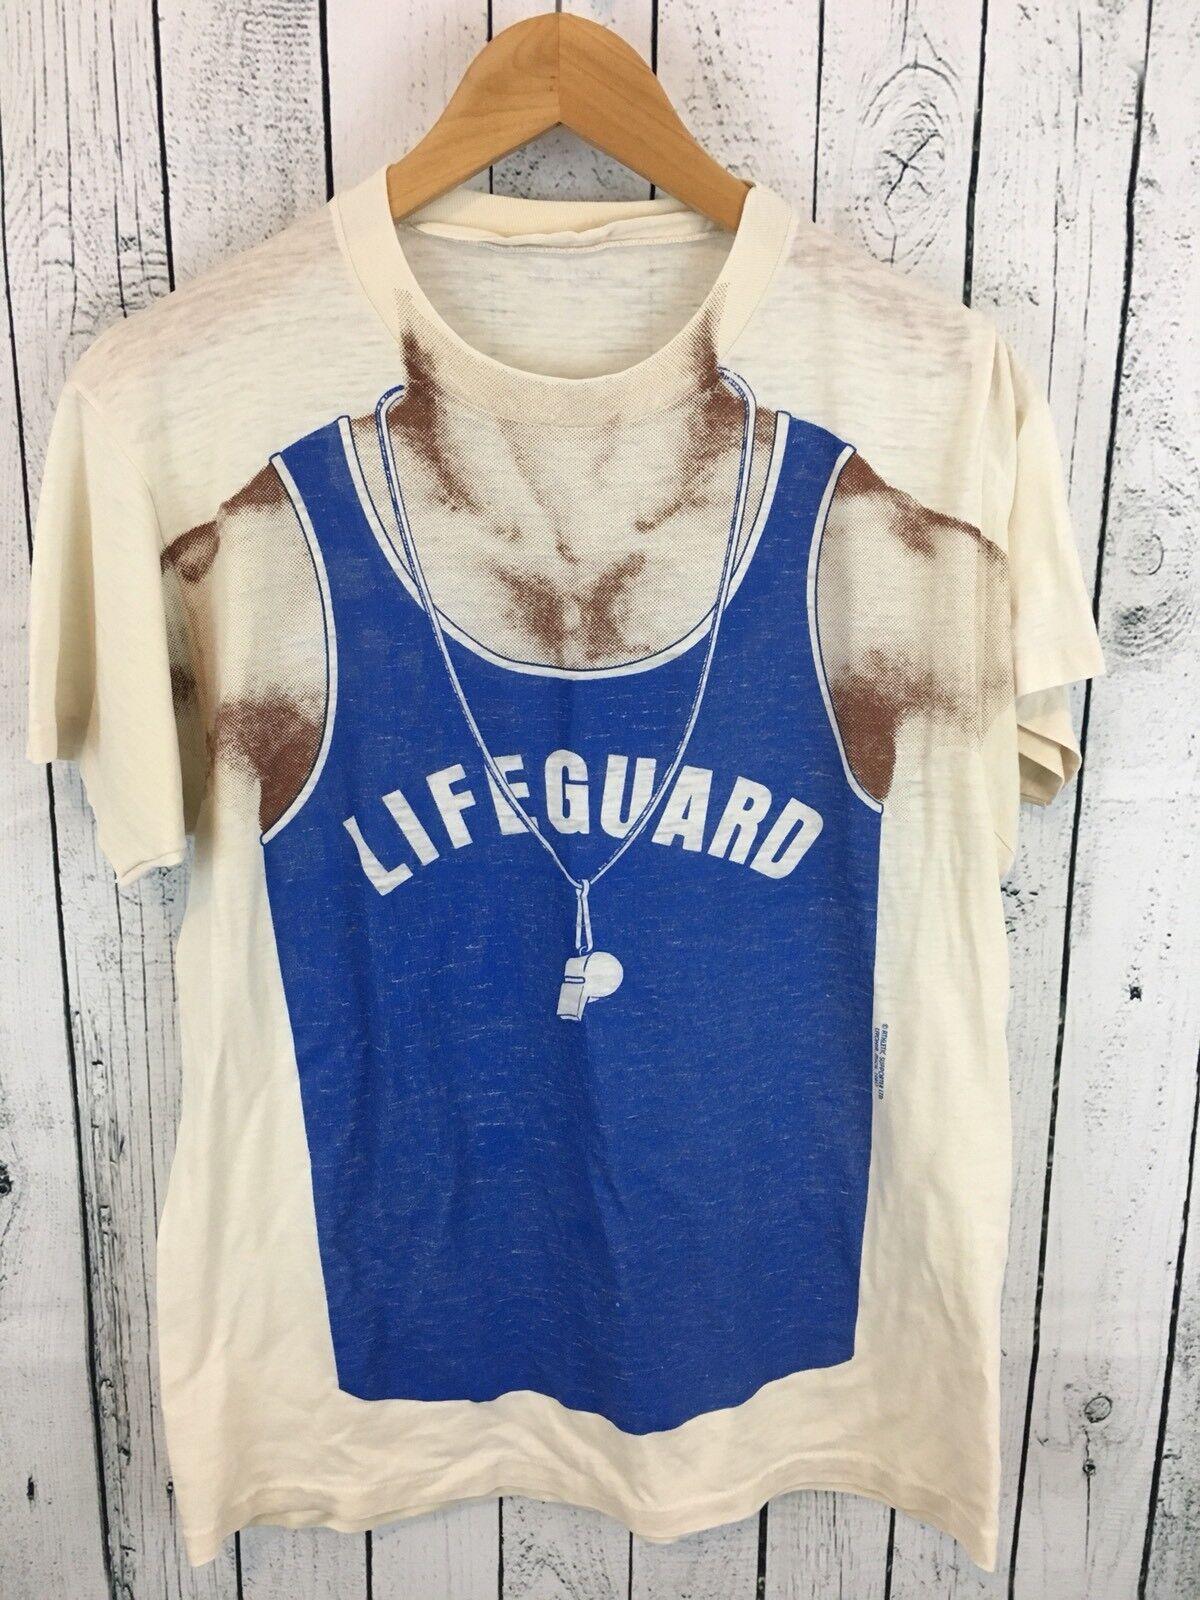 VTG ATHLETIC SUPPORTER LTD. Lifeguard T Shirt Size M L Beige AWESOME V3